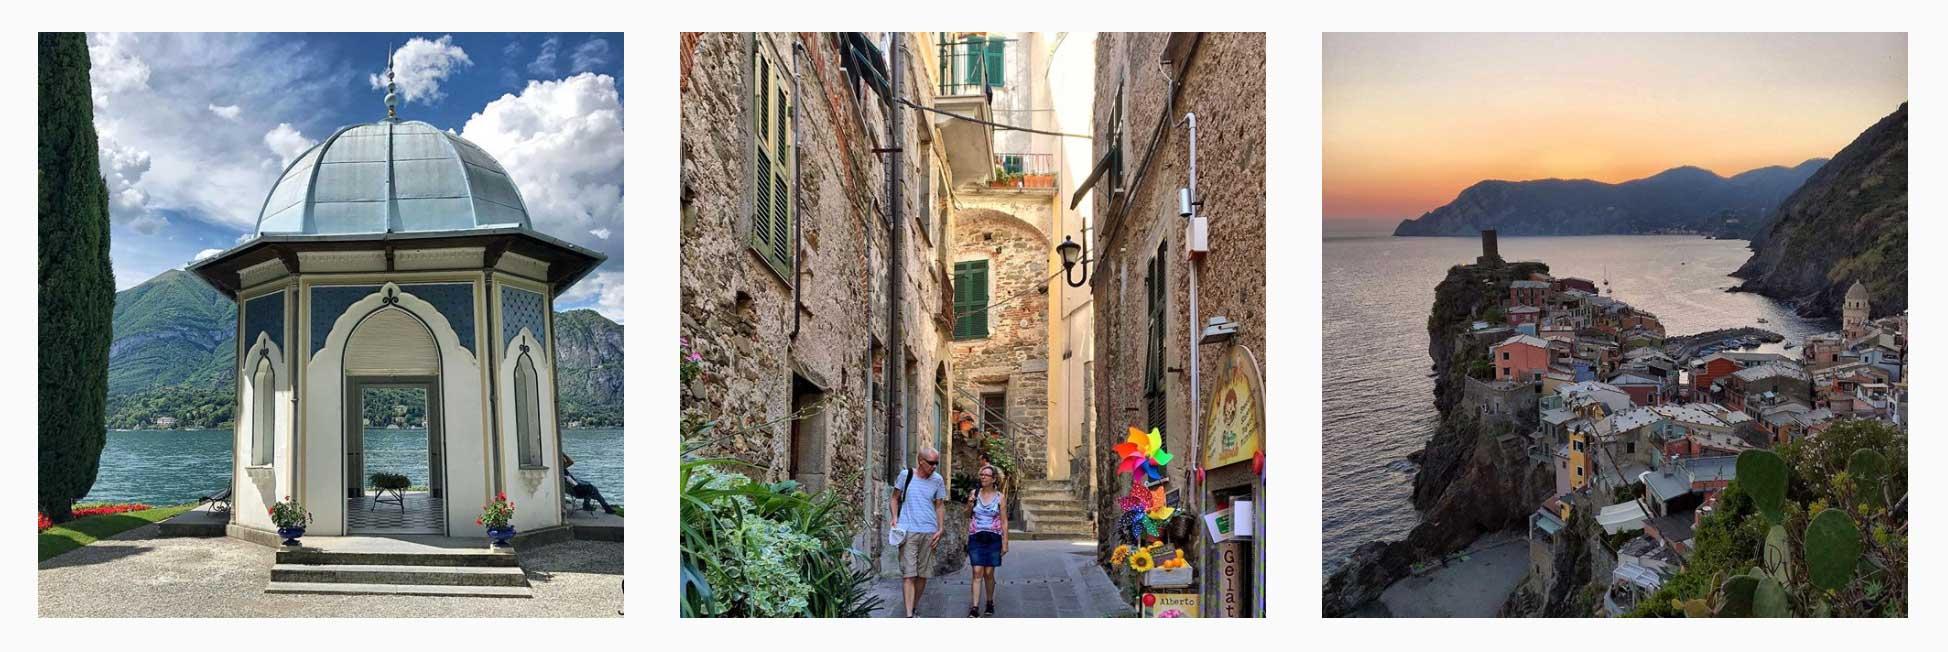 Borghi antichi travel blogger